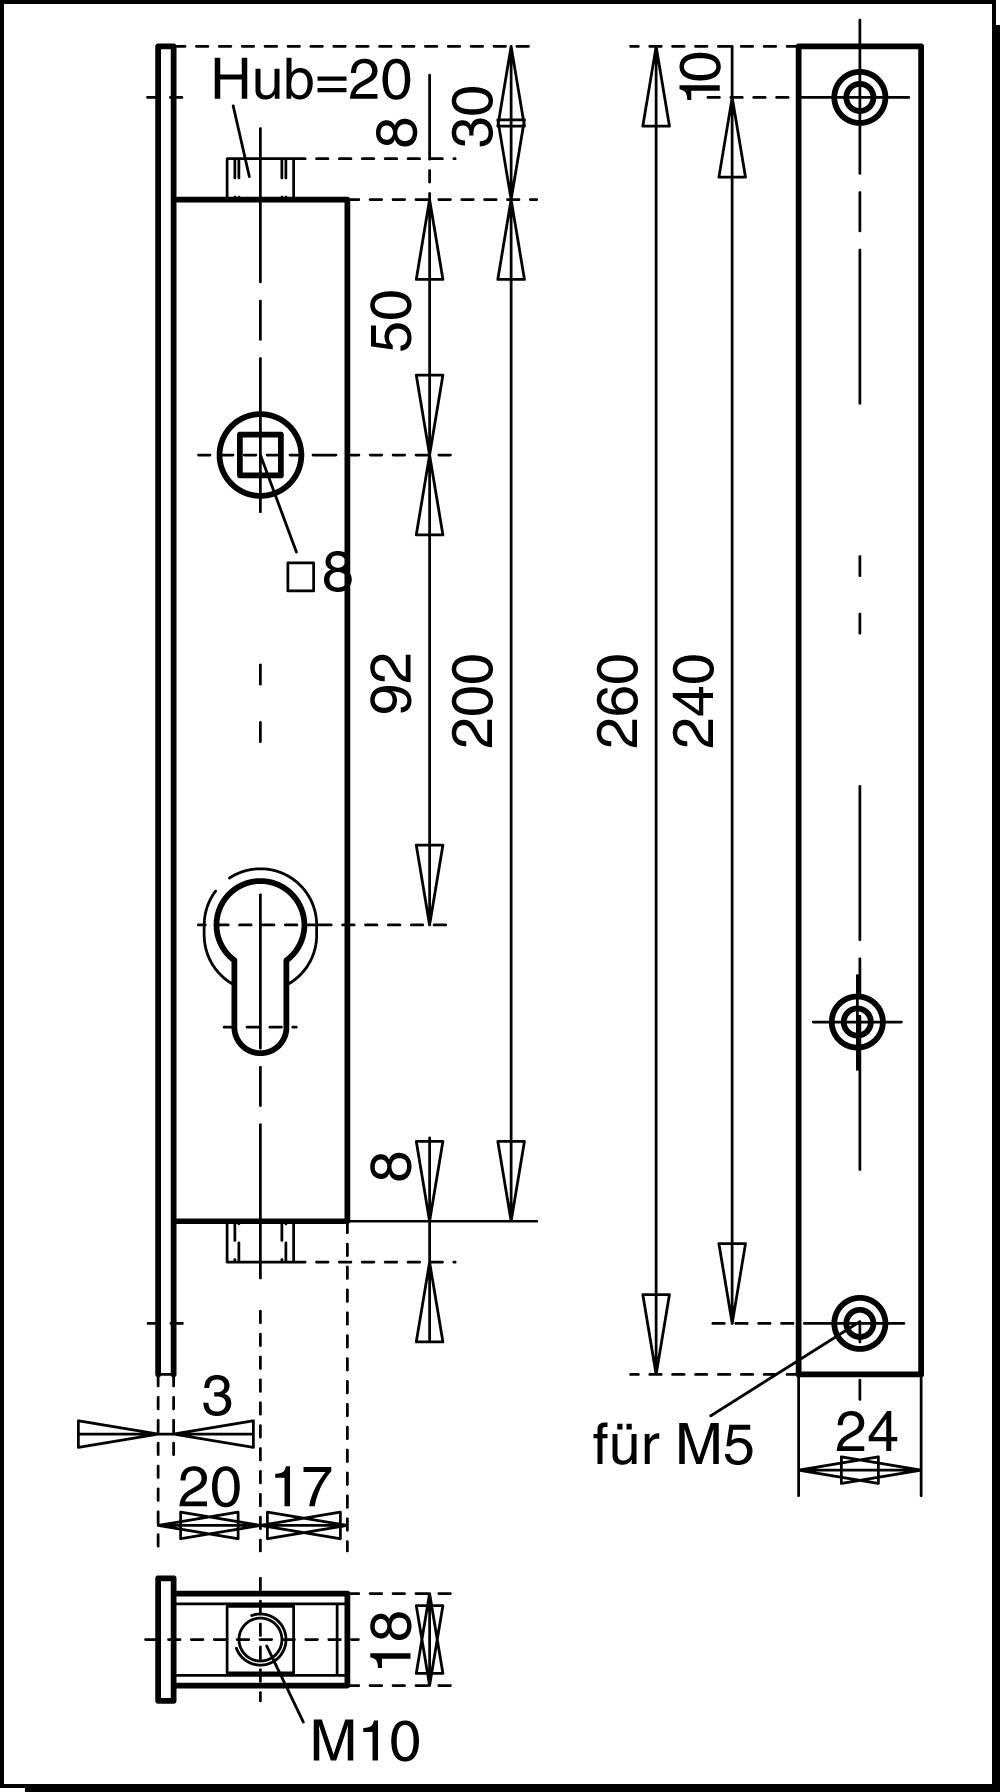 treibriegelschloss f r tore treibriegel treib kantriegel schl sser verriegelungen. Black Bedroom Furniture Sets. Home Design Ideas